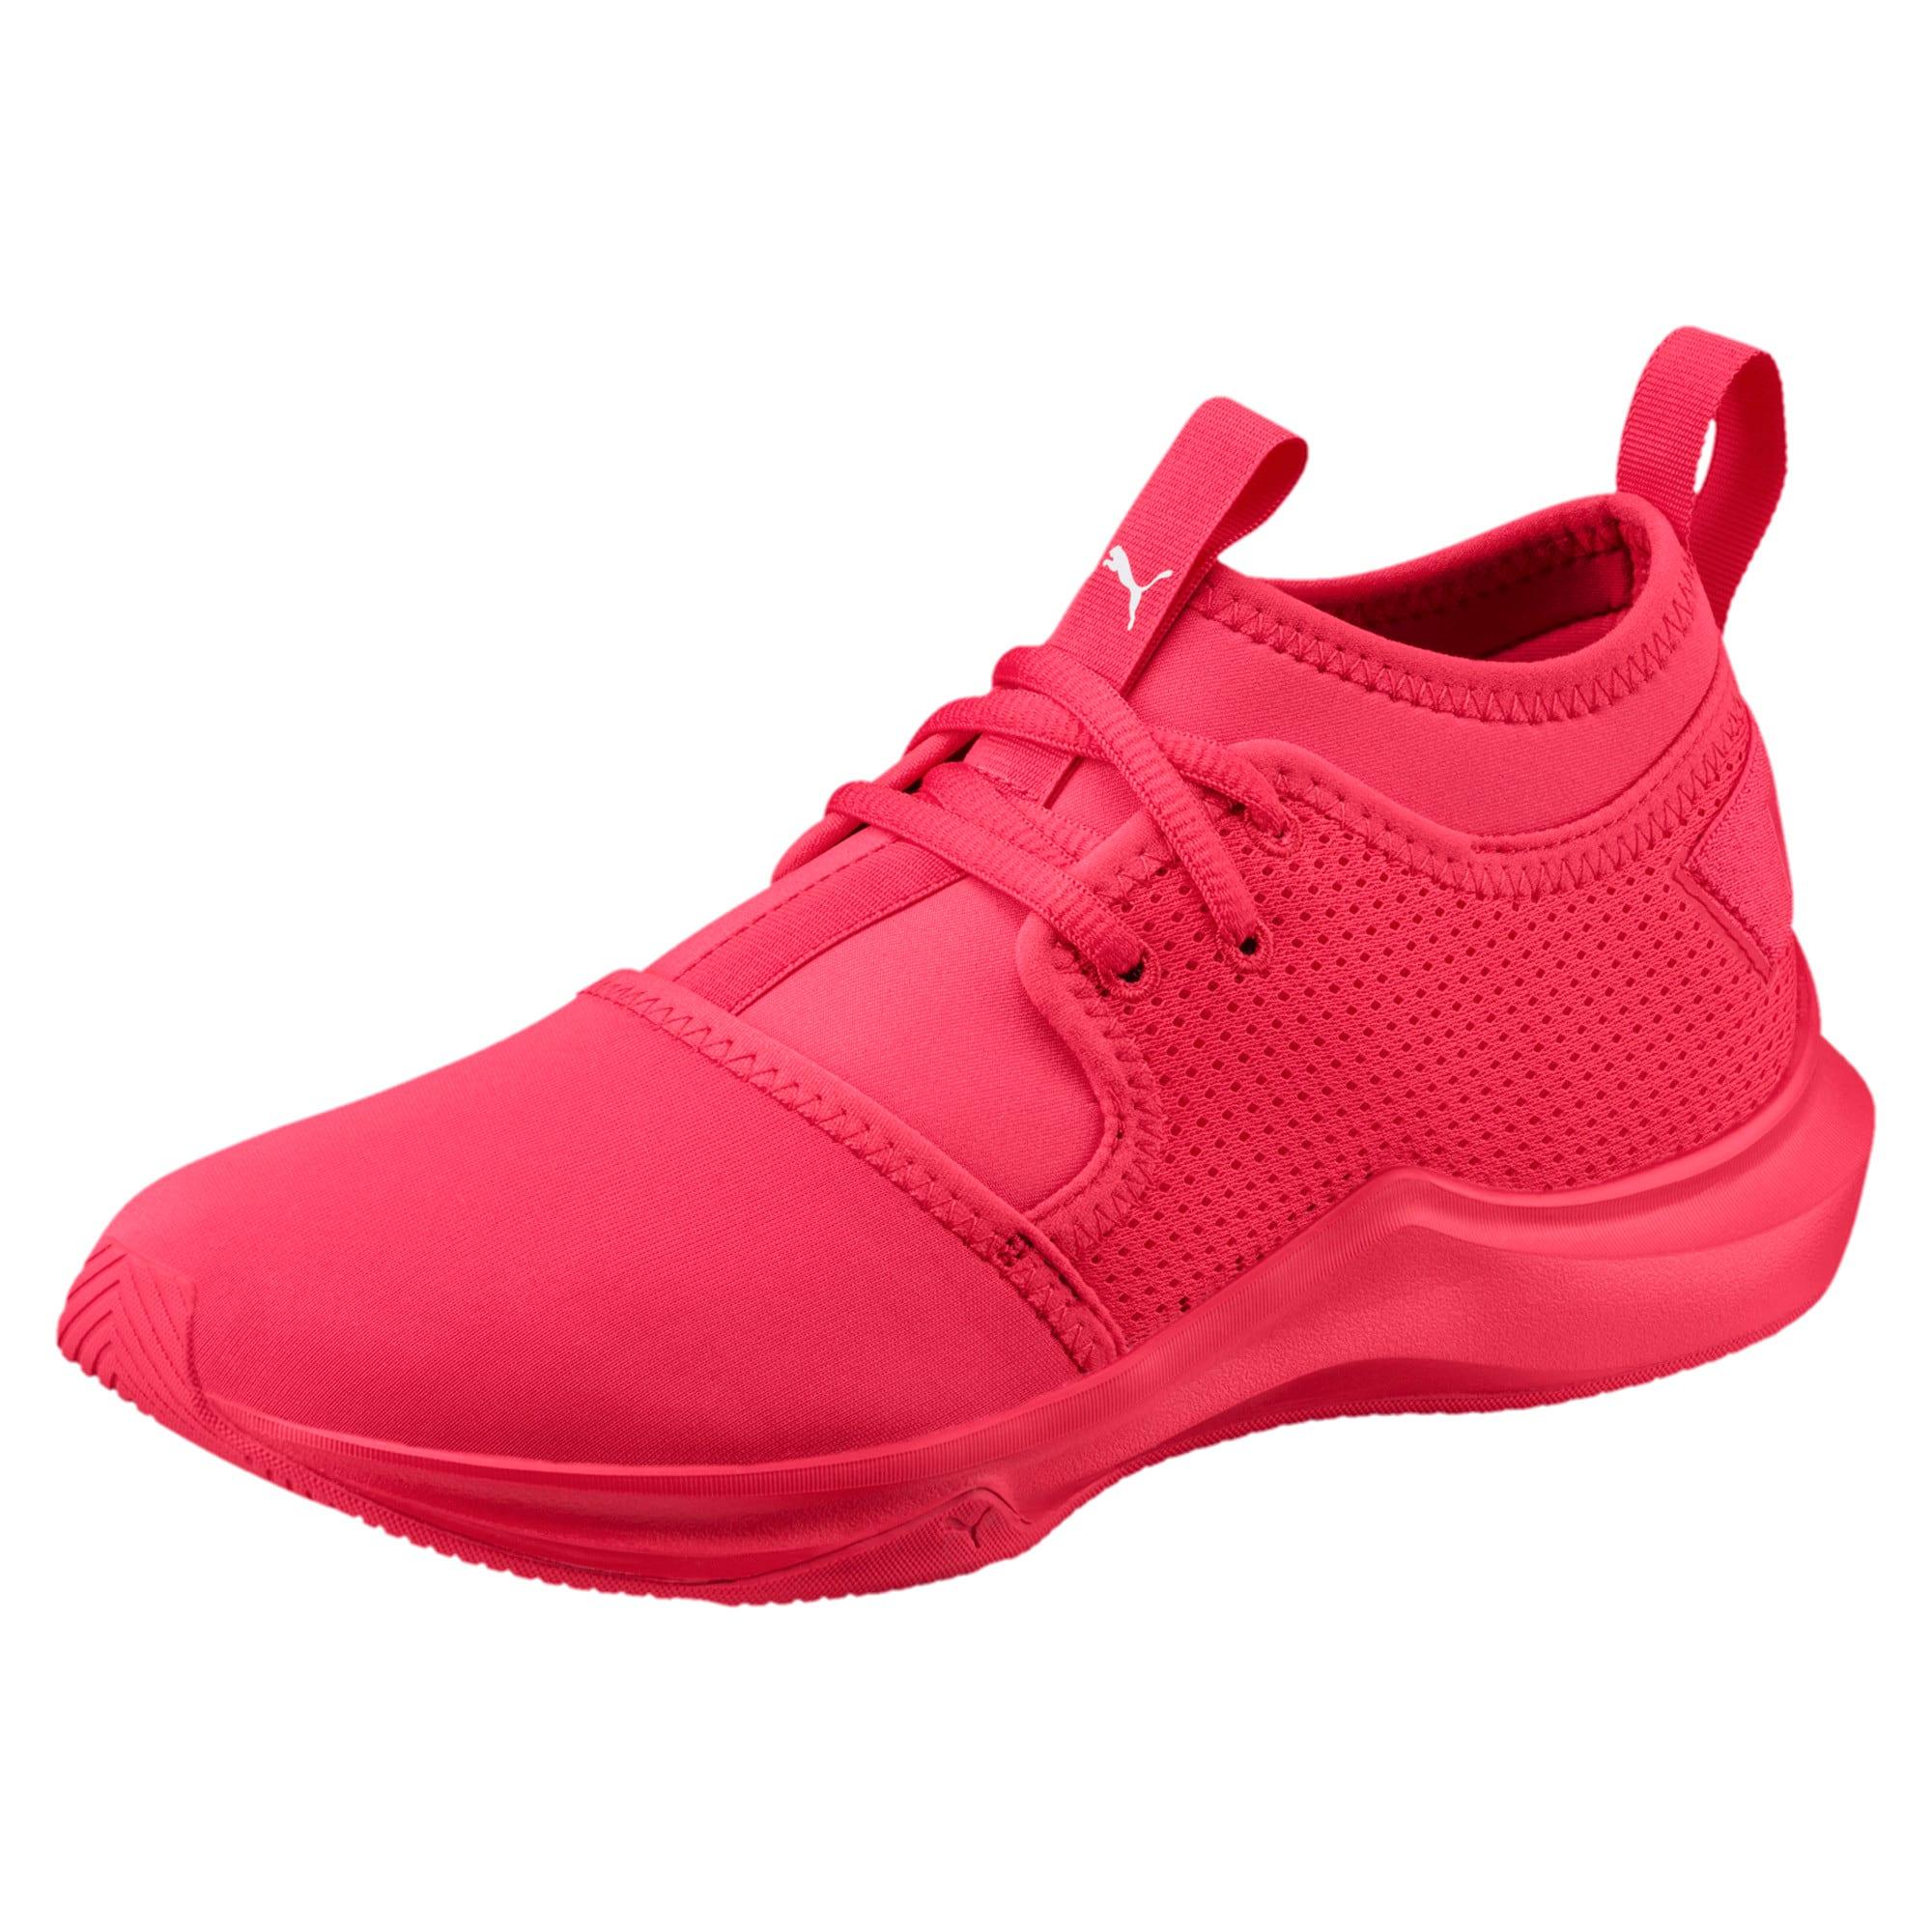 Thumbnail 1 of Phenom Lo Women's Training Shoes, Paradise Pink-Paradise Pink, medium